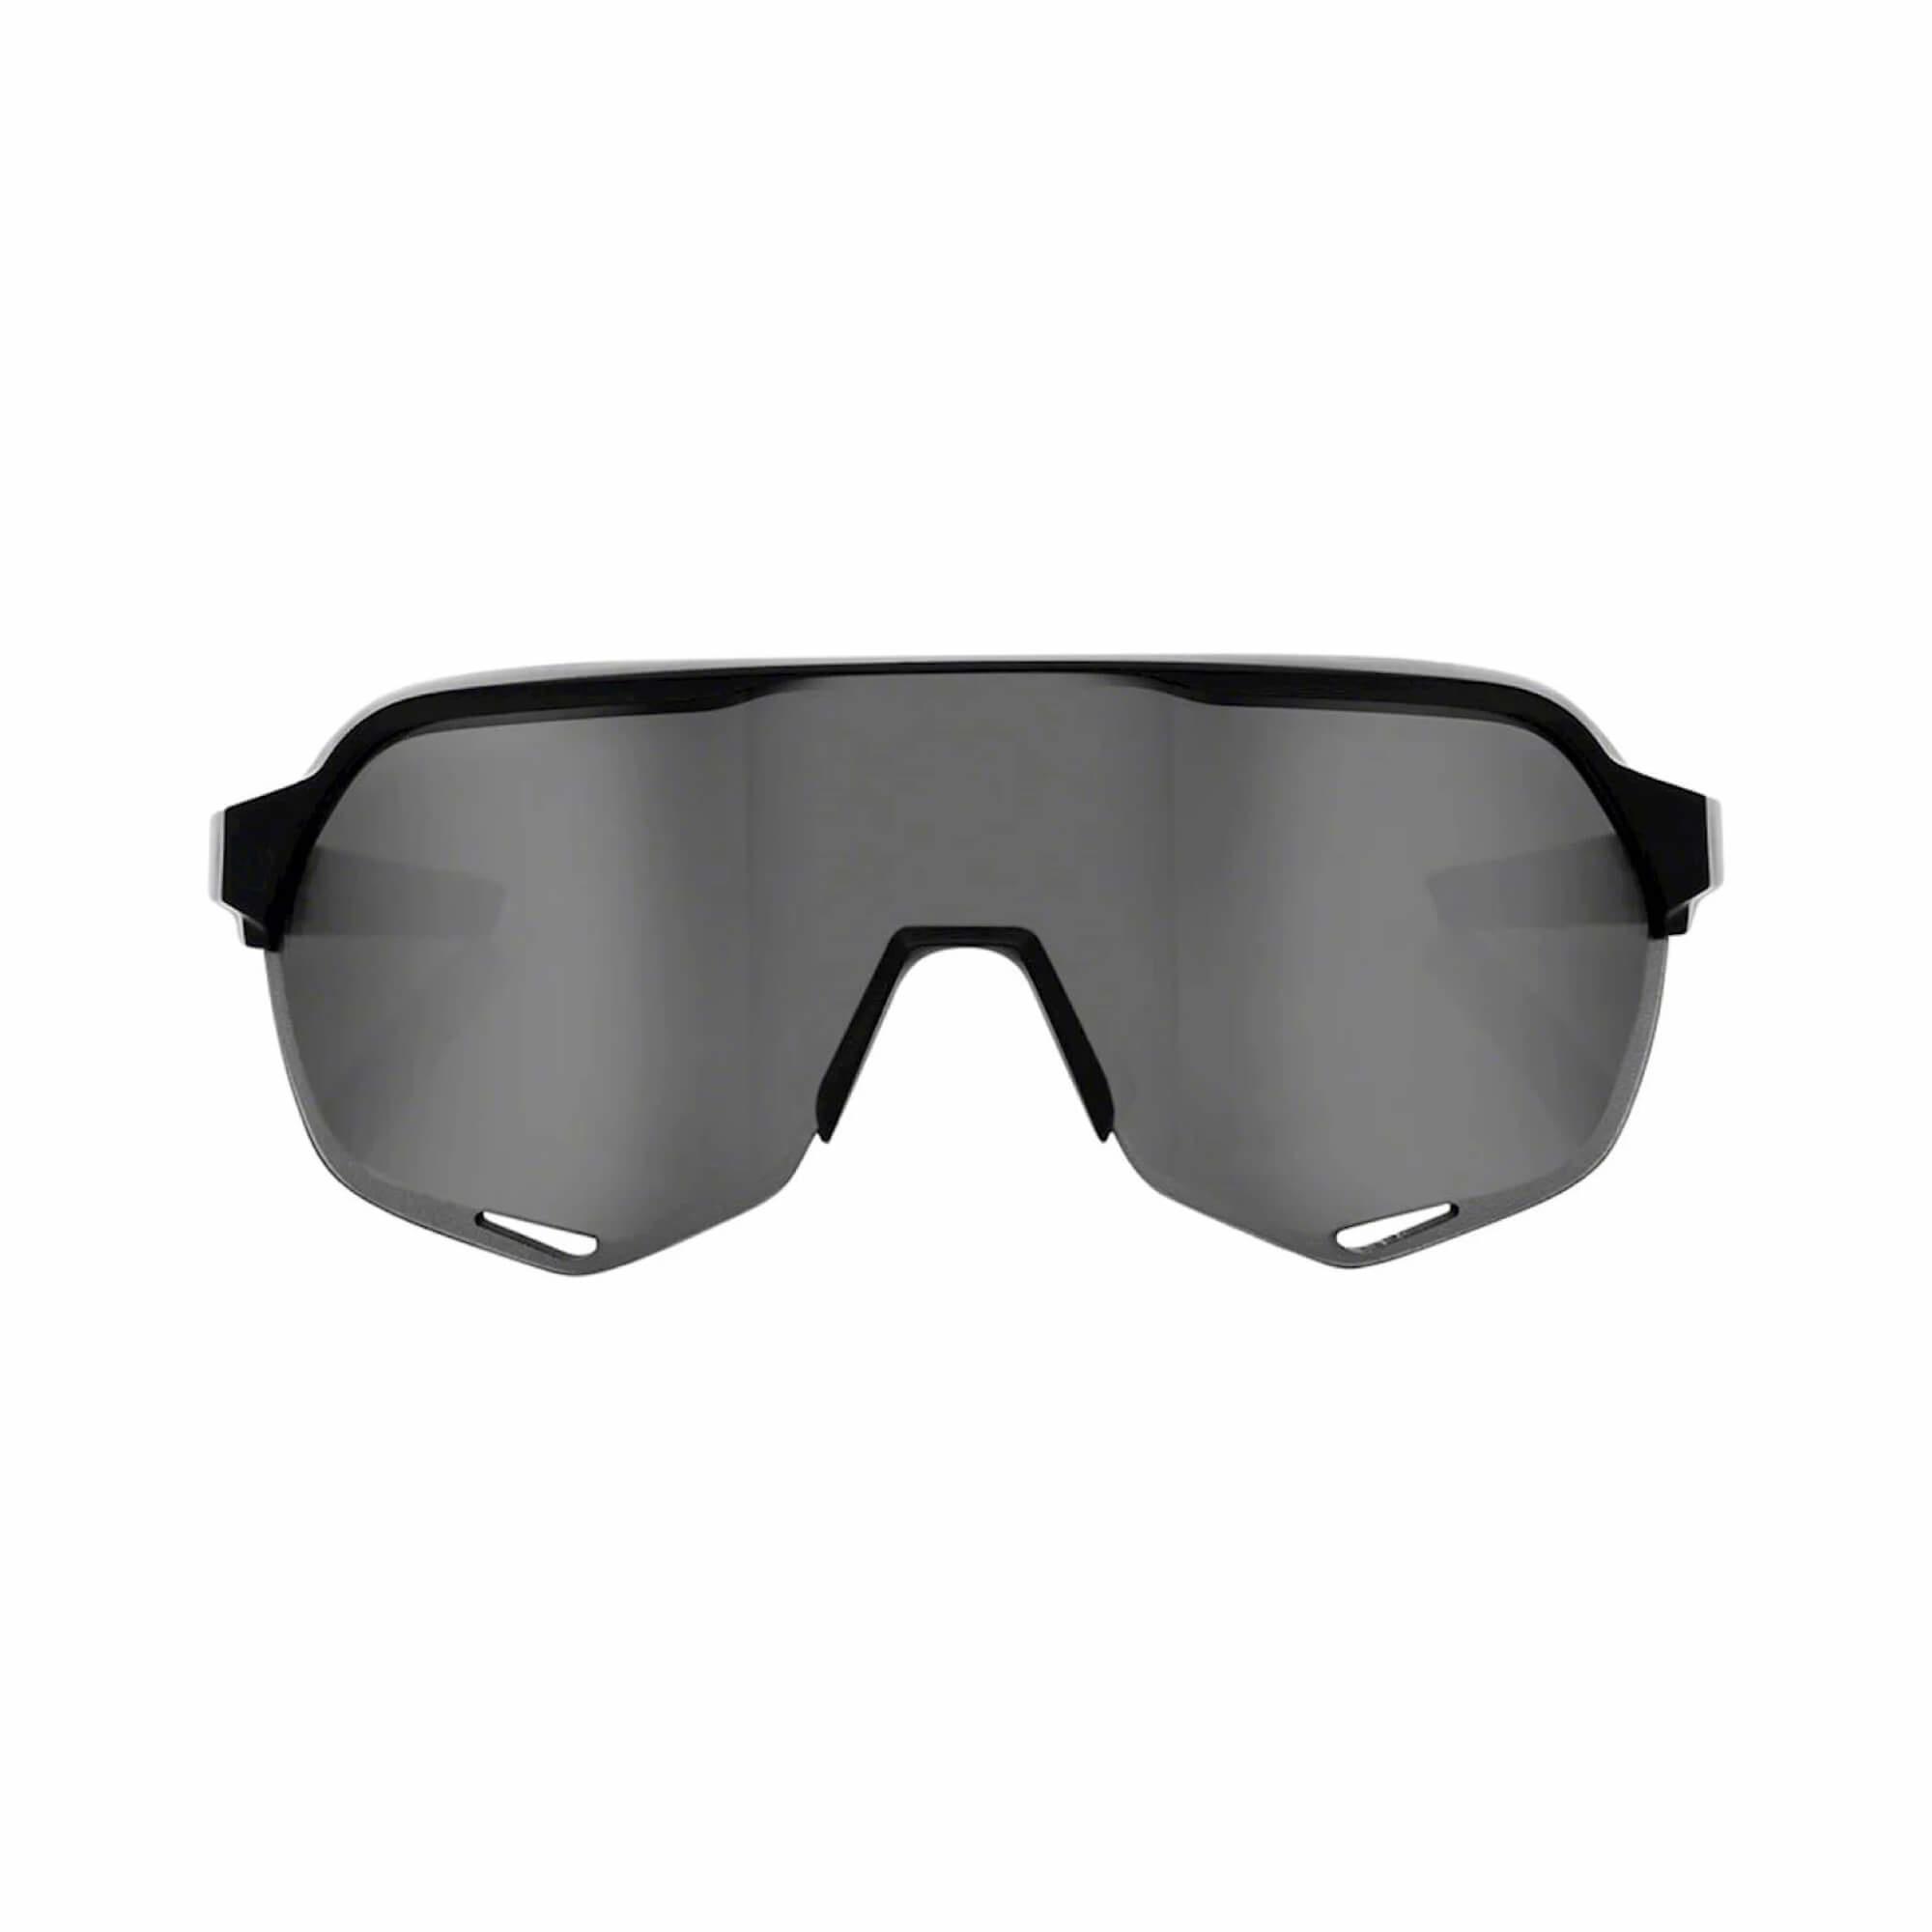 S2 Soft Tact Black Smoke Lens-2